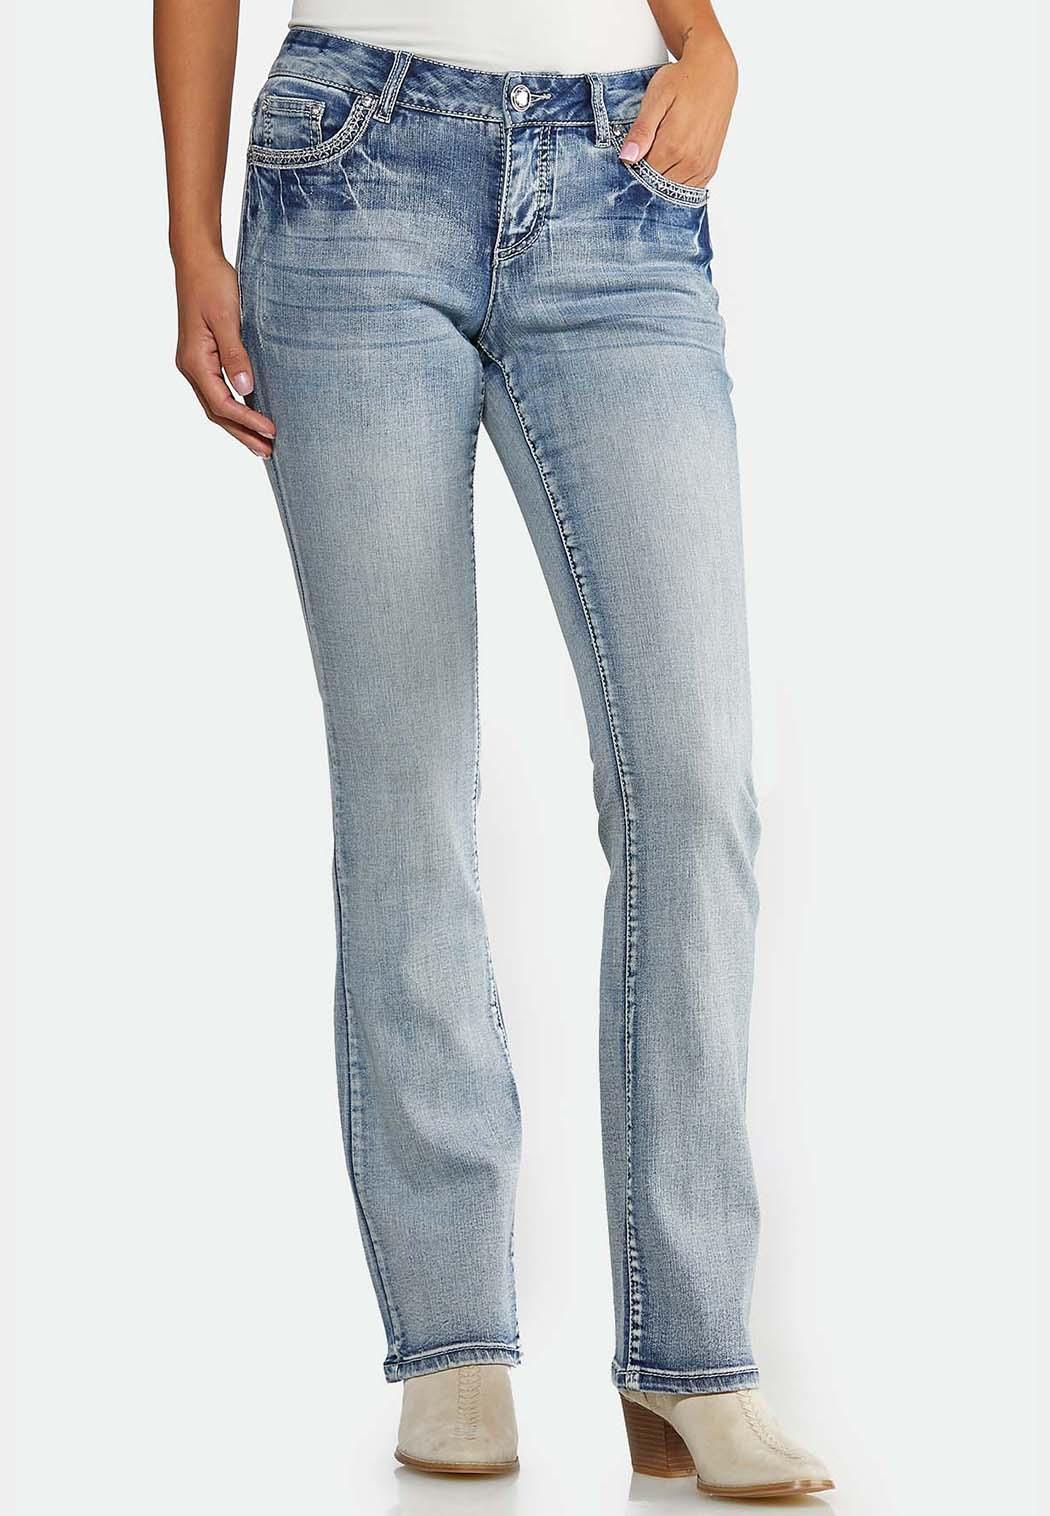 Sparkling Embroidered Jeans (Item #43926284)